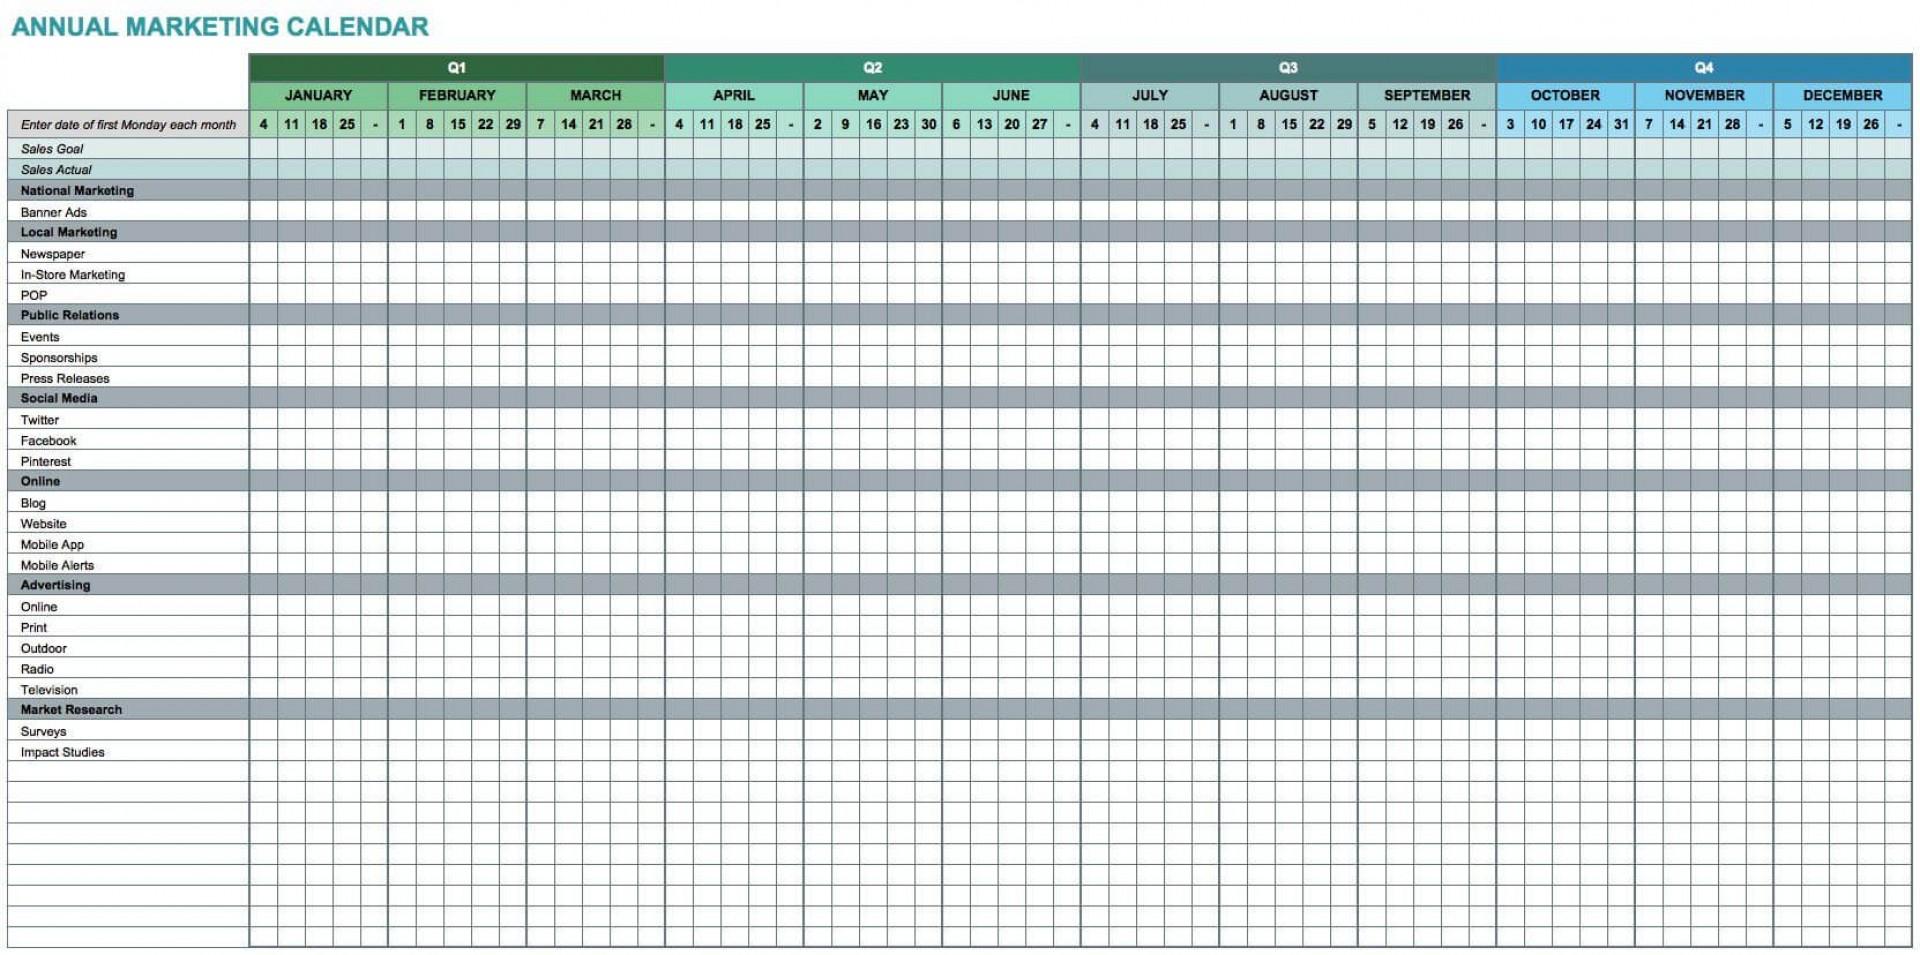 002 Wonderful Free Excel Calendar Template Photo  2020 Monthly Download Biweekly Payroll 20181920